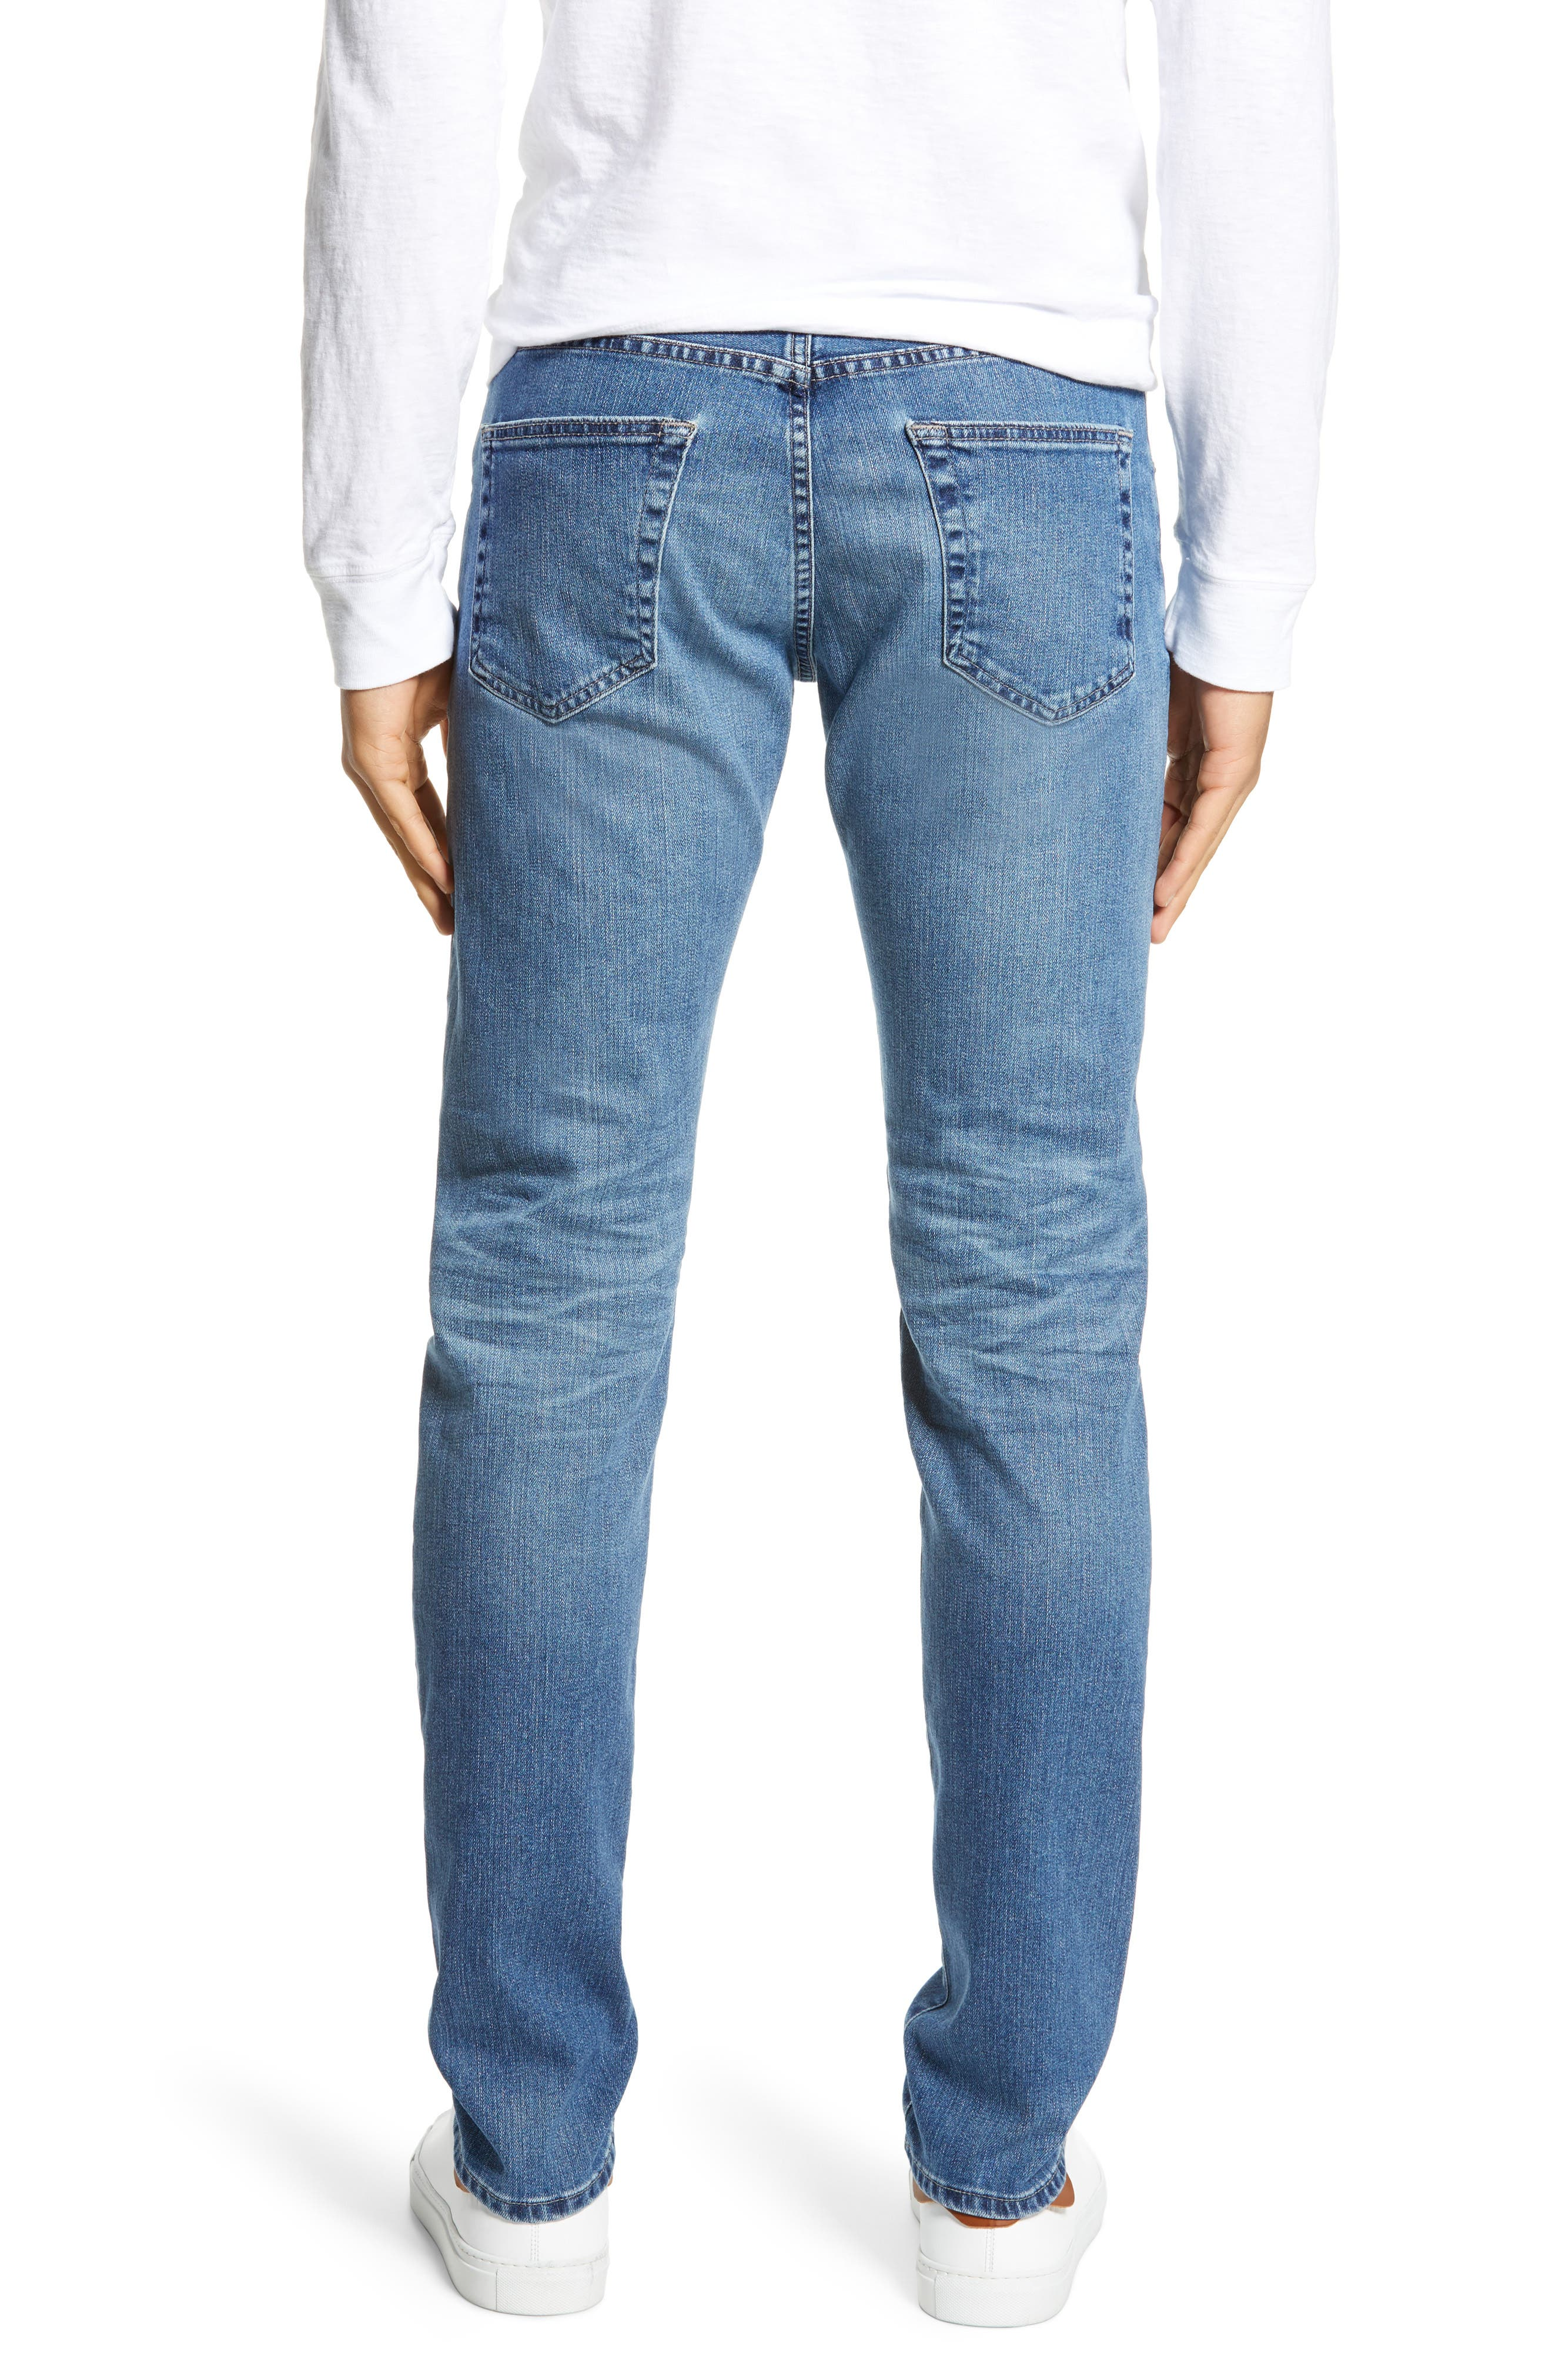 Tellis Slim Fit Jeans,                             Alternate thumbnail 2, color,                             16 YEARS EAVES